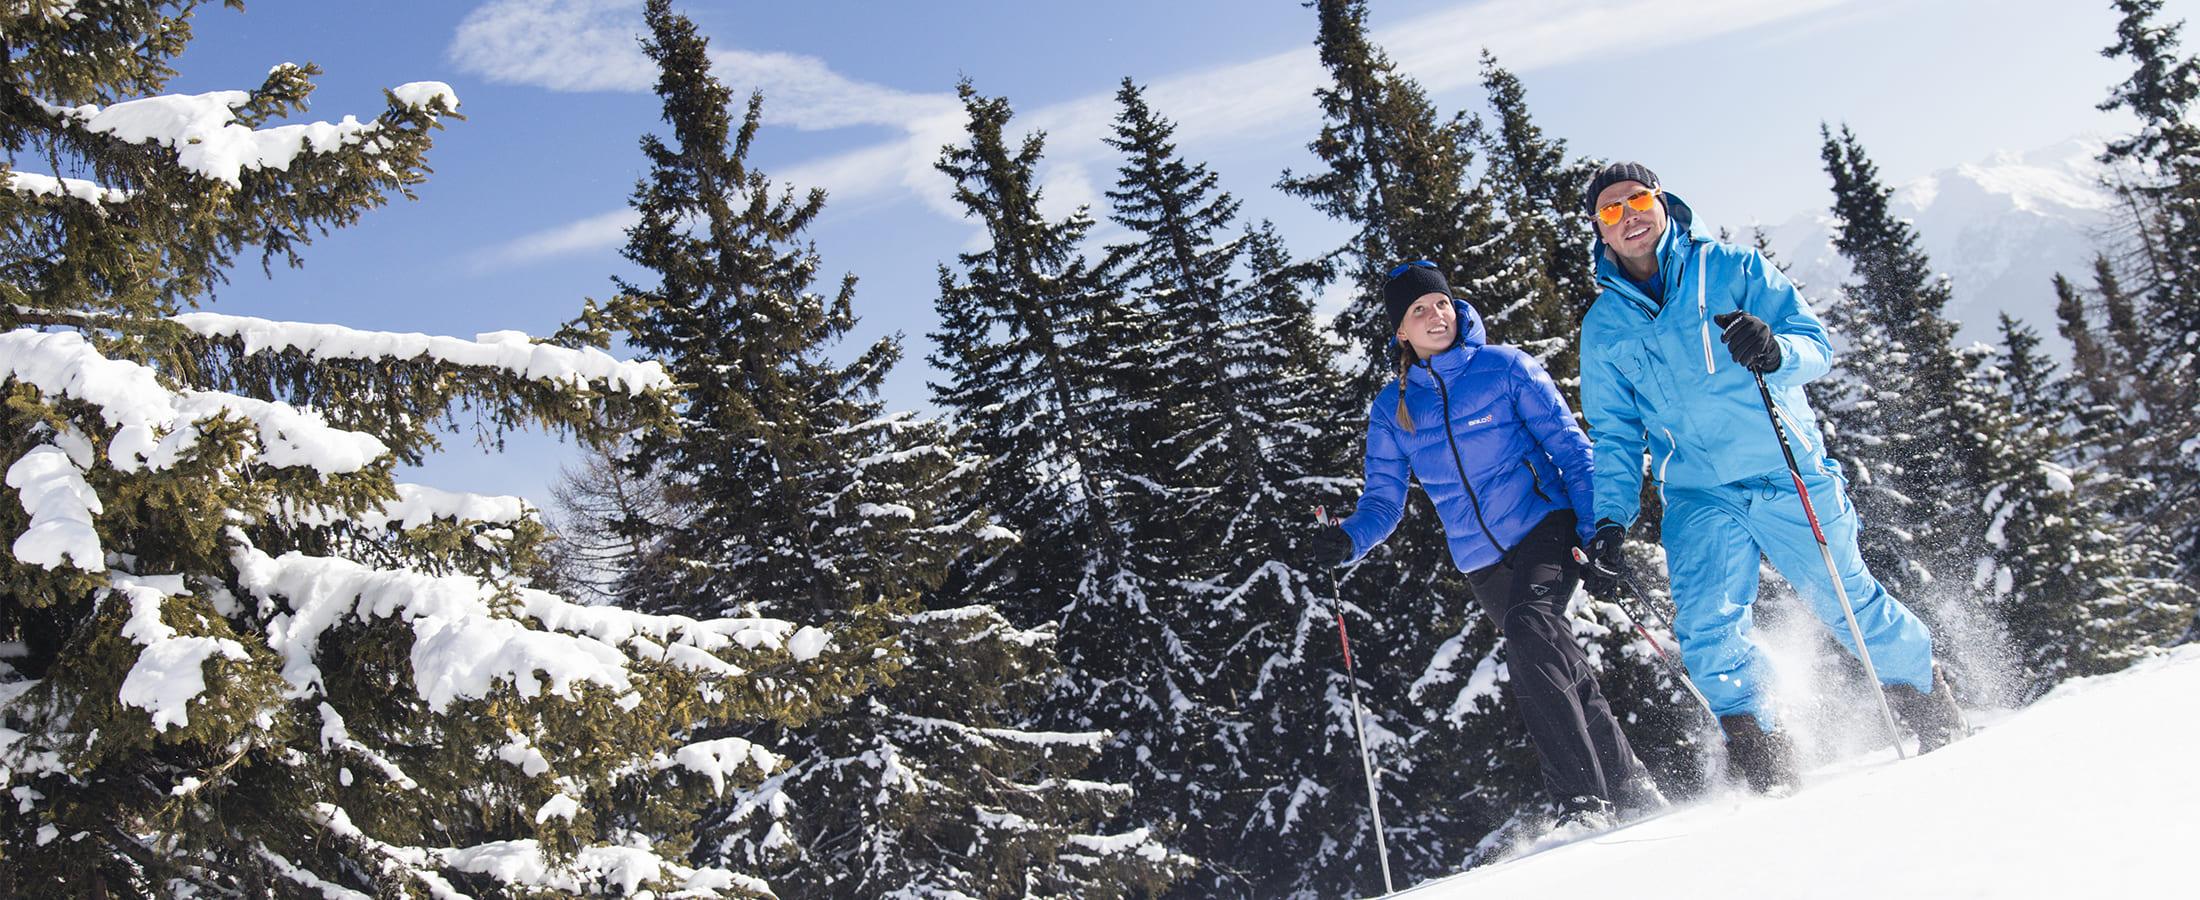 Lichtung Woldererhof - Romantische Schneeschuhwanderung